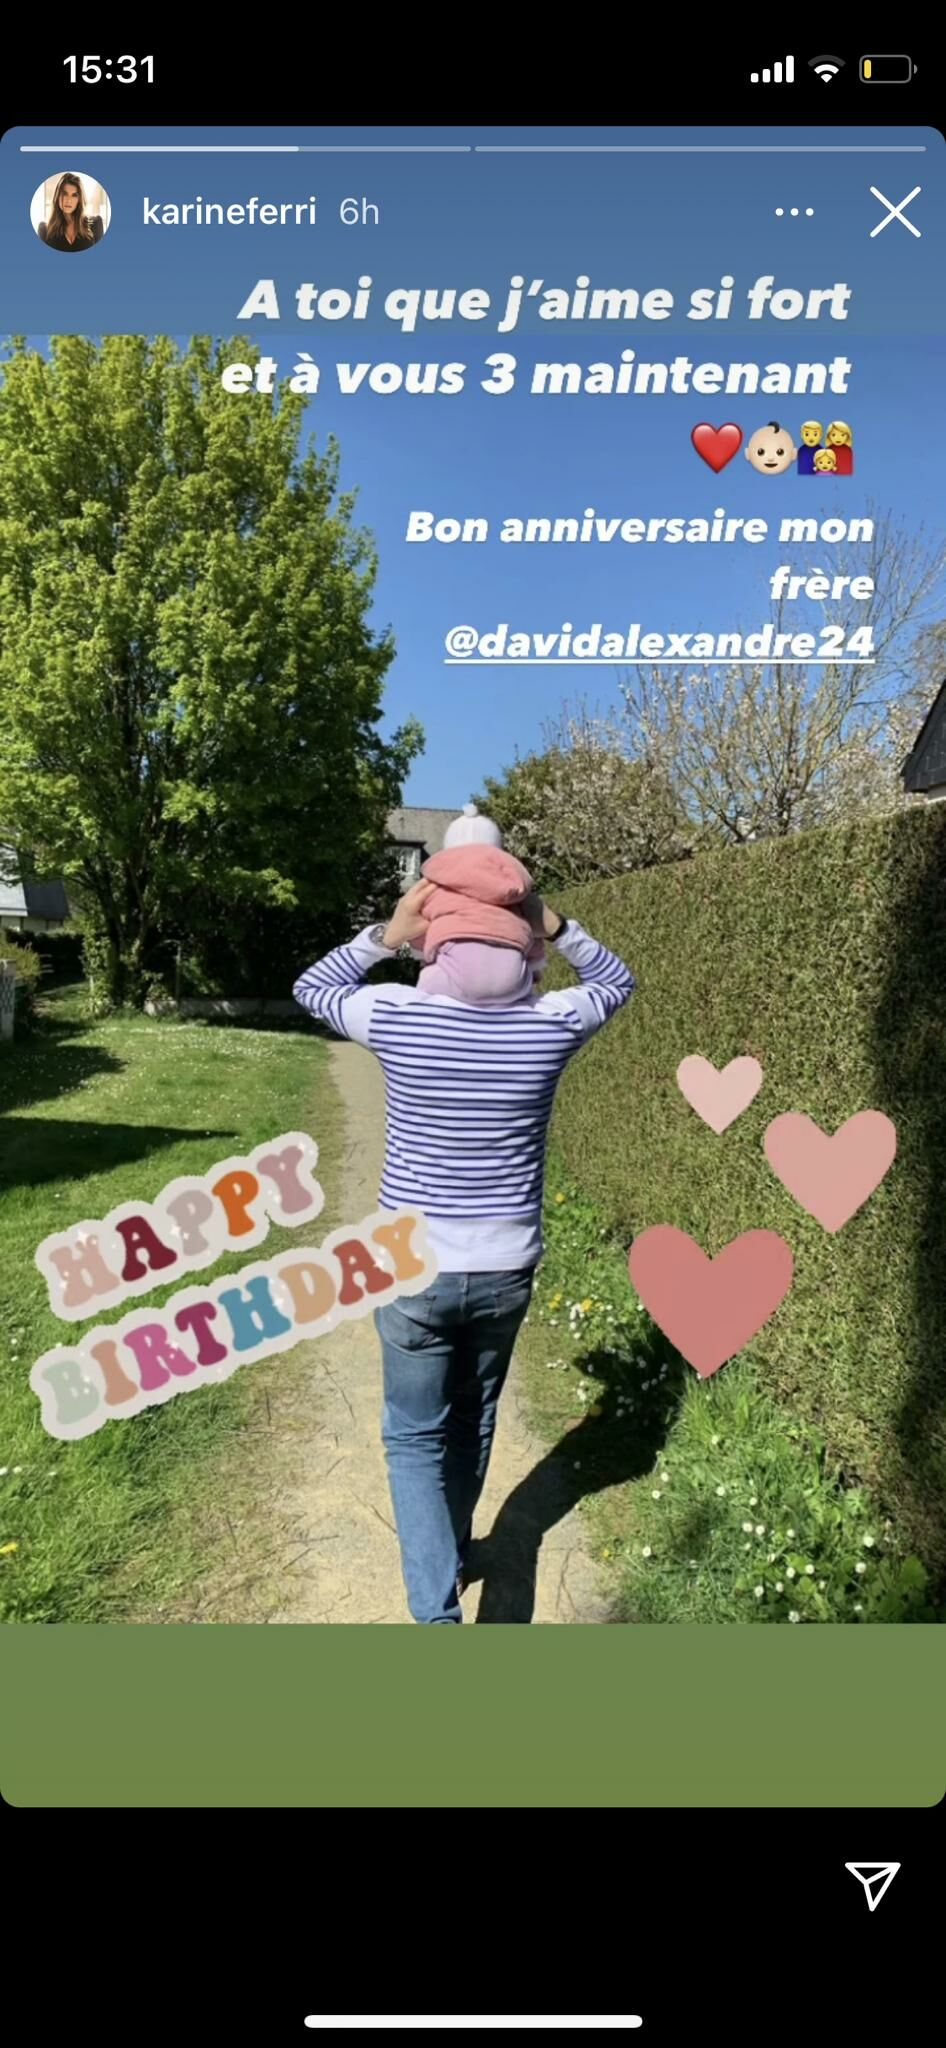 Karine Ferri souhaite l'anniversaire de son frère David, le samedi 24 avril 2021.